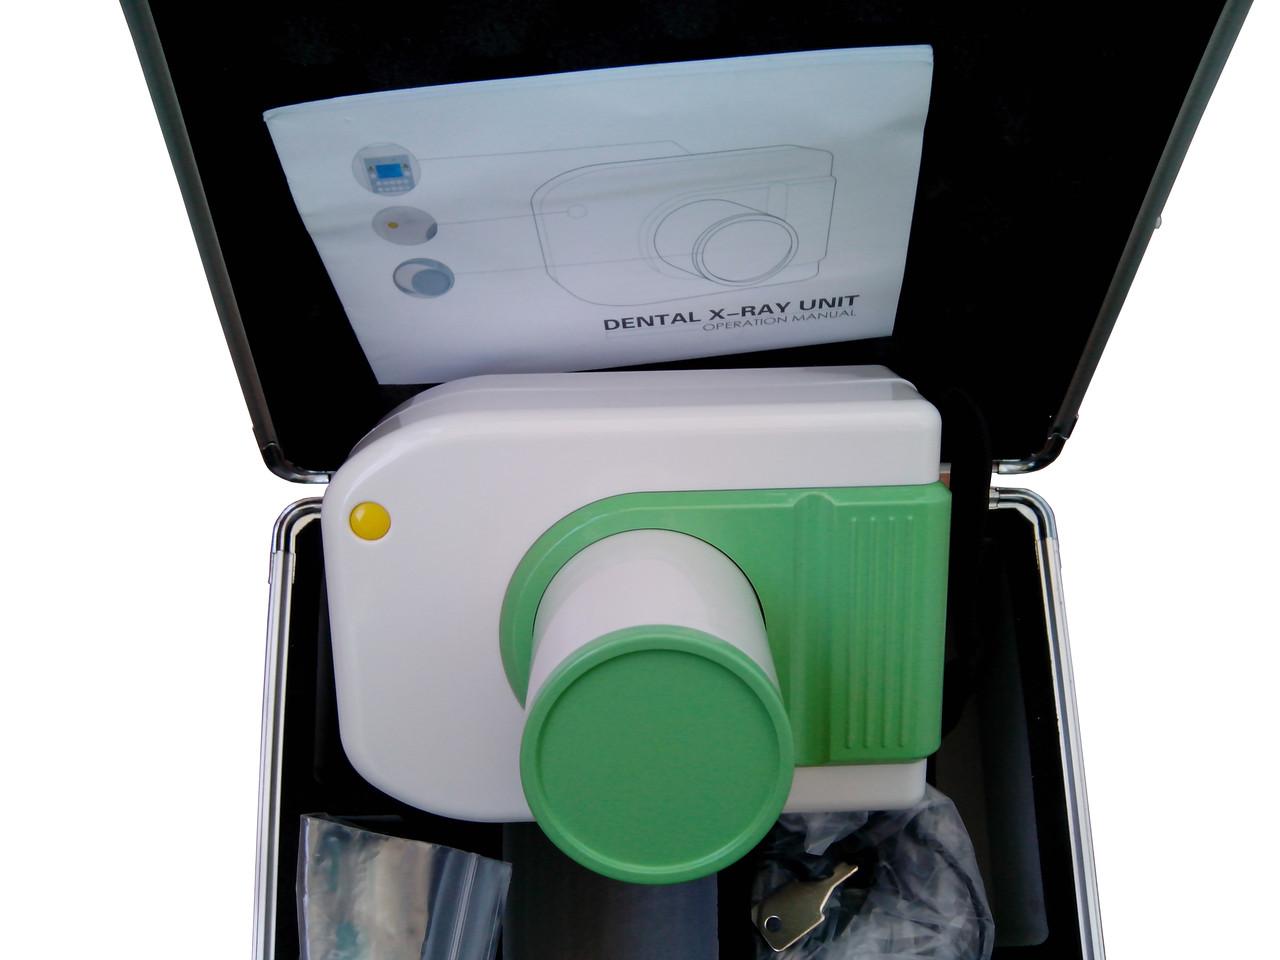 BLE, рентген, рентген аппарат, рентген стоматологический, рентген портативный, дентальный рентген аппарат